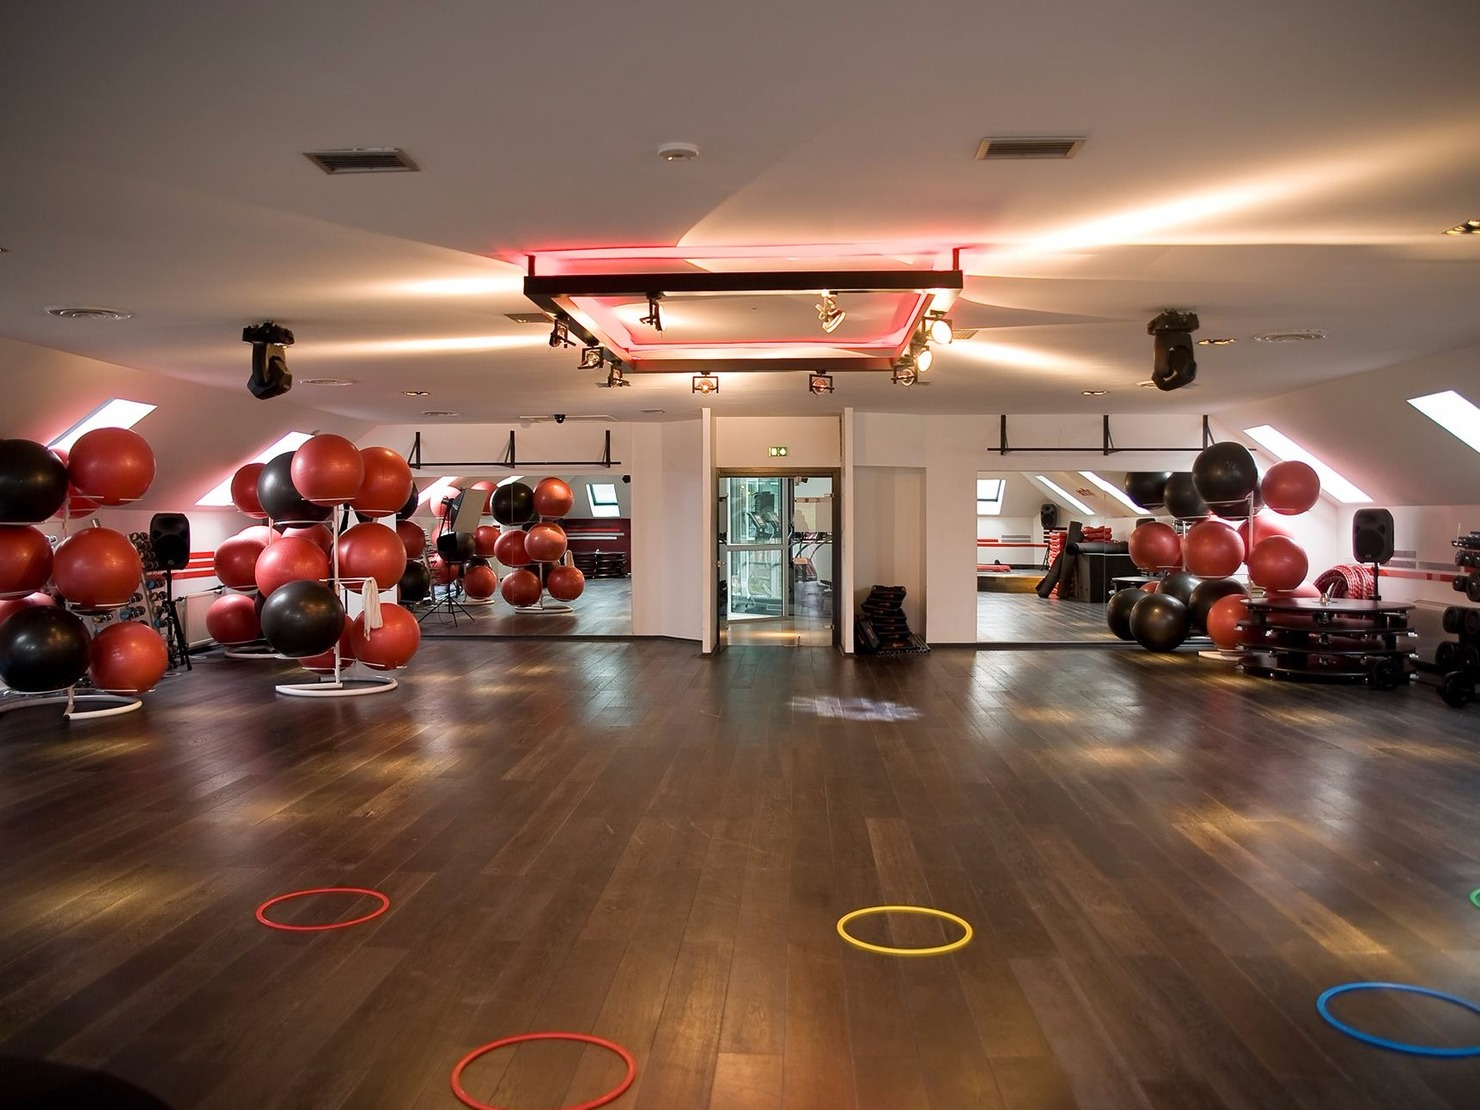 wellness sport club besancon ecole valentin tarifs avis horaires essai gratuit. Black Bedroom Furniture Sets. Home Design Ideas